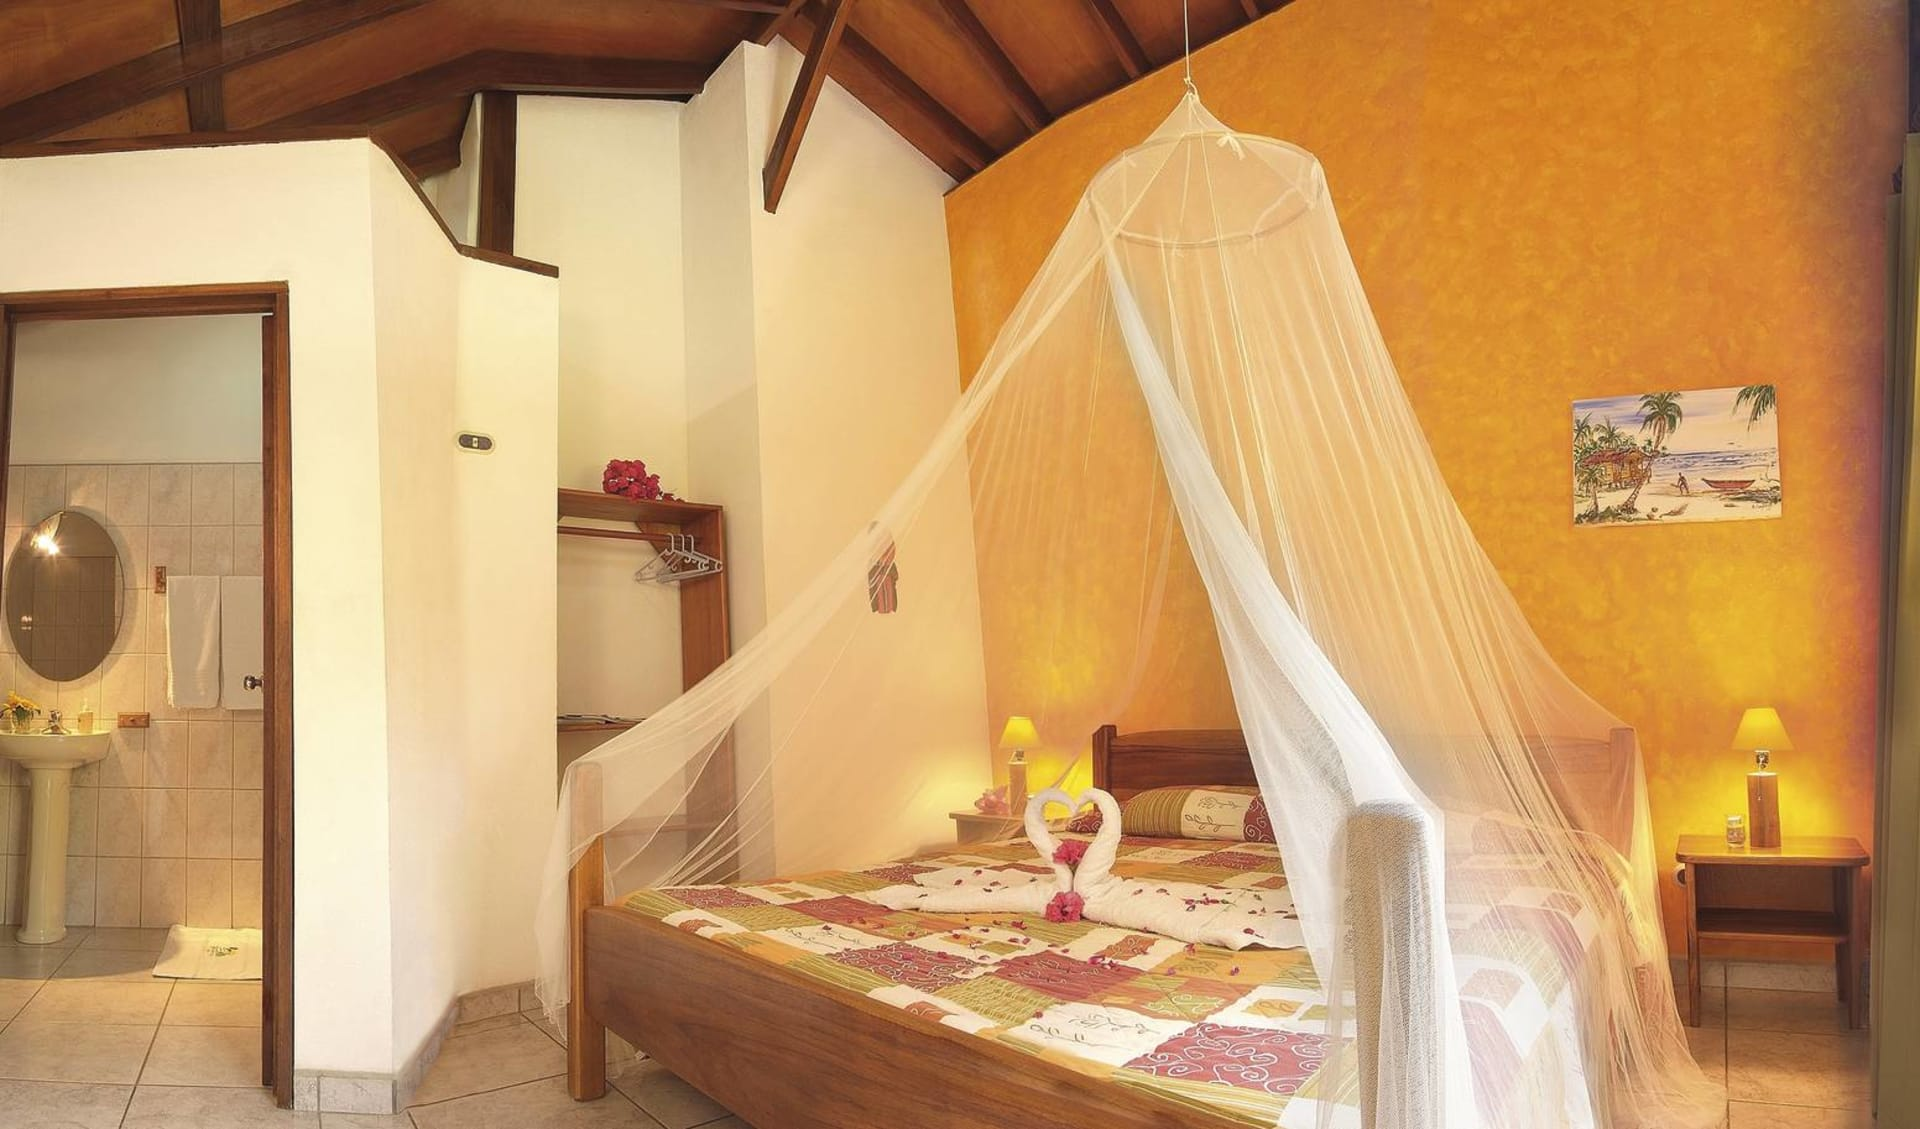 Suizo Loco Lodge in Cahuita:  Suizo Loco - Doppelzimmer